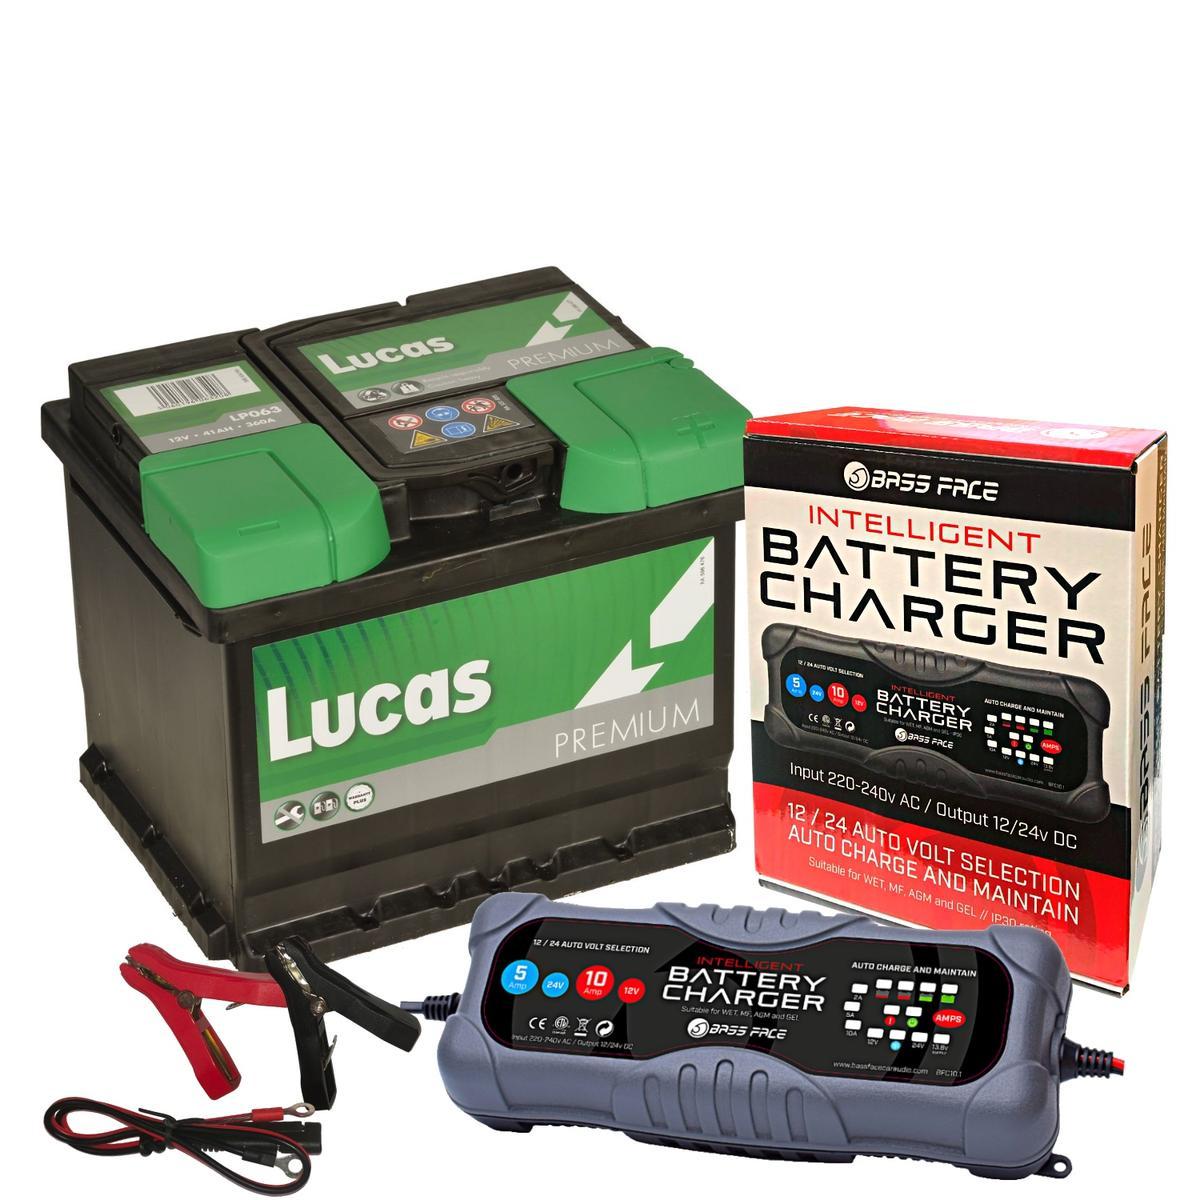 Lucas LP063 Audi VW Seat 4 Year Car Battery 12v 44Ah 420CC W/ 10 Amp Charger